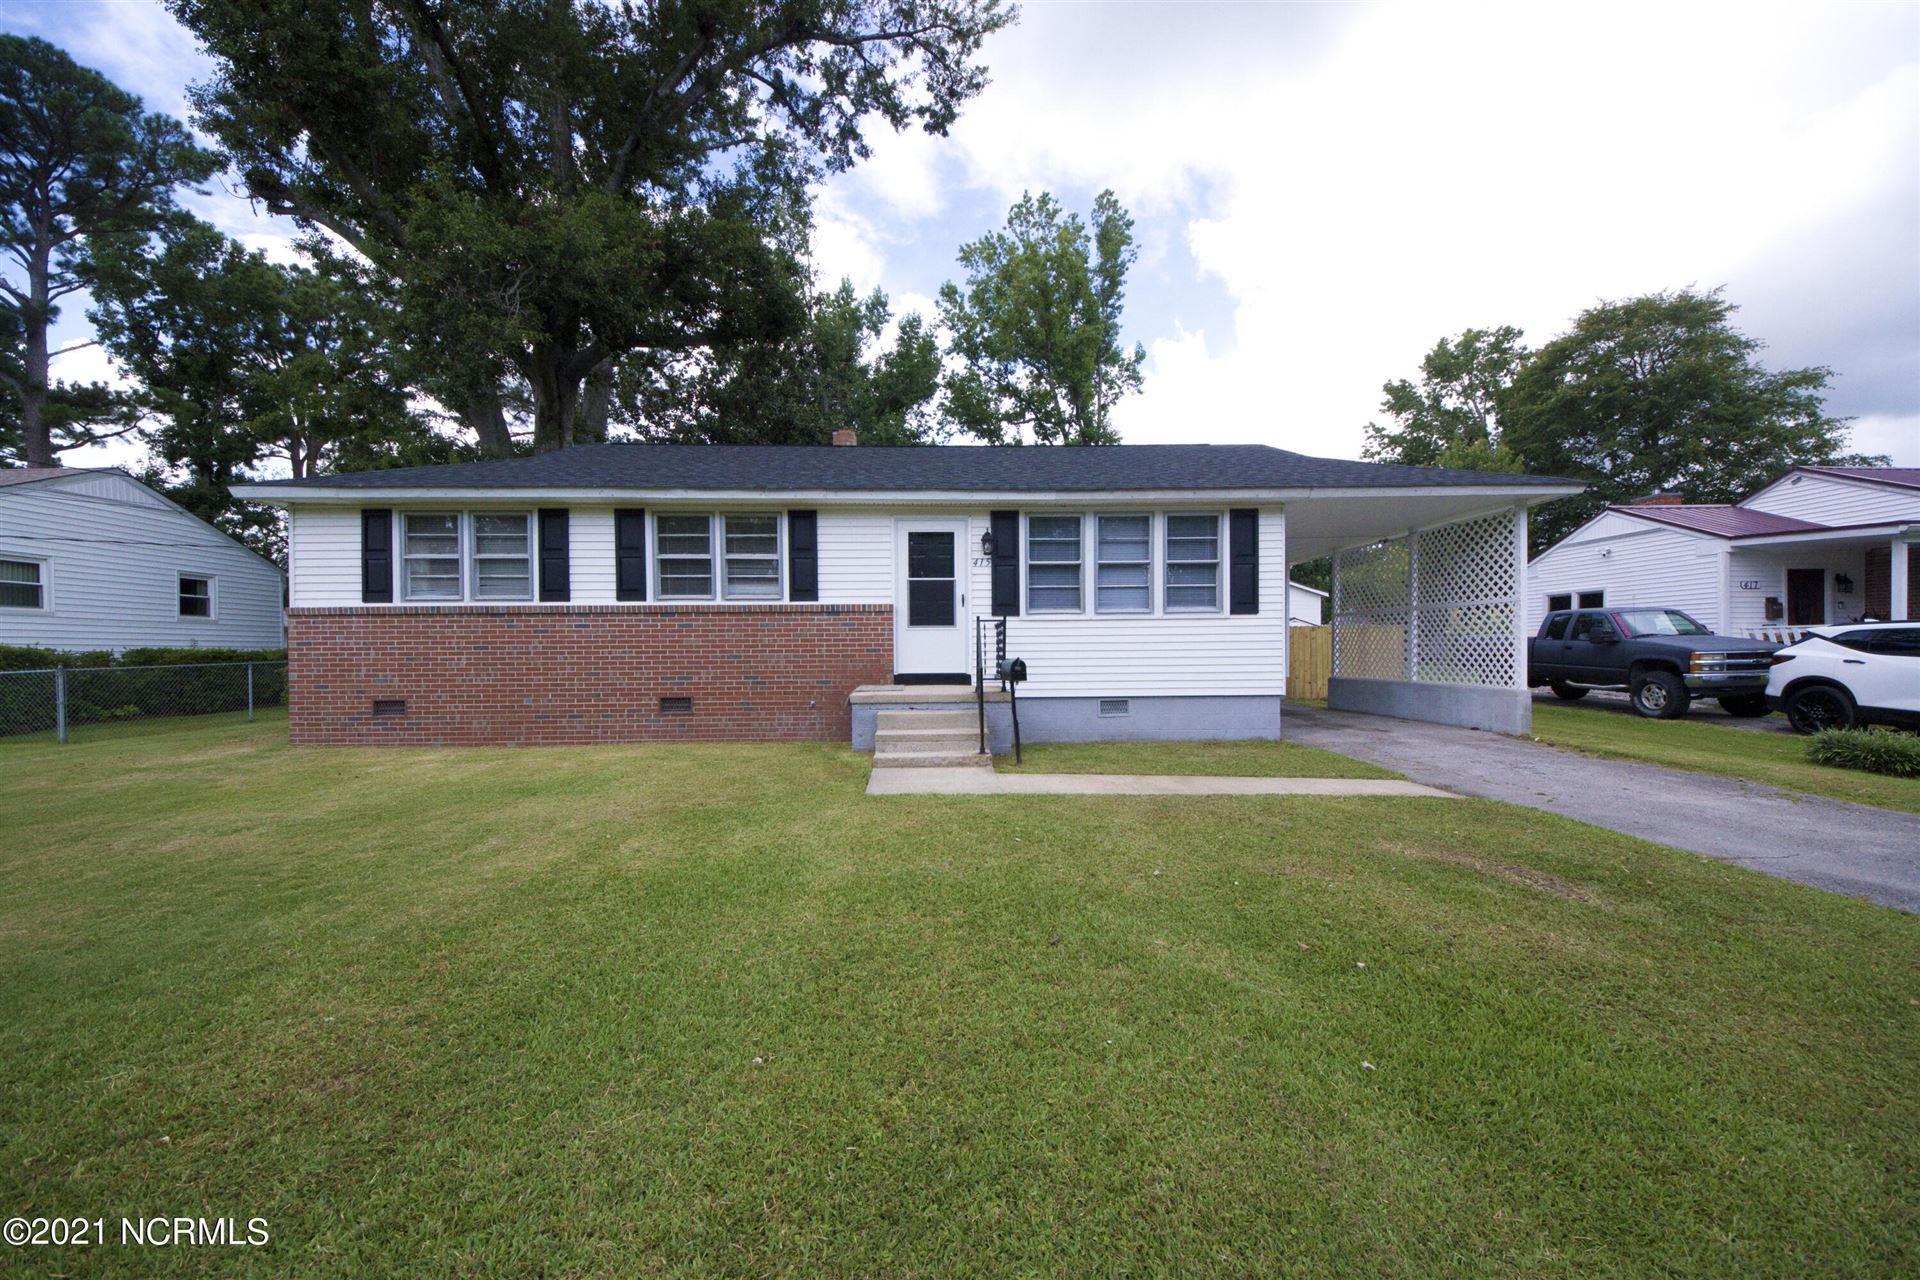 Photo of 415 Cheyenne Road, Jacksonville, NC 28540 (MLS # 100286312)